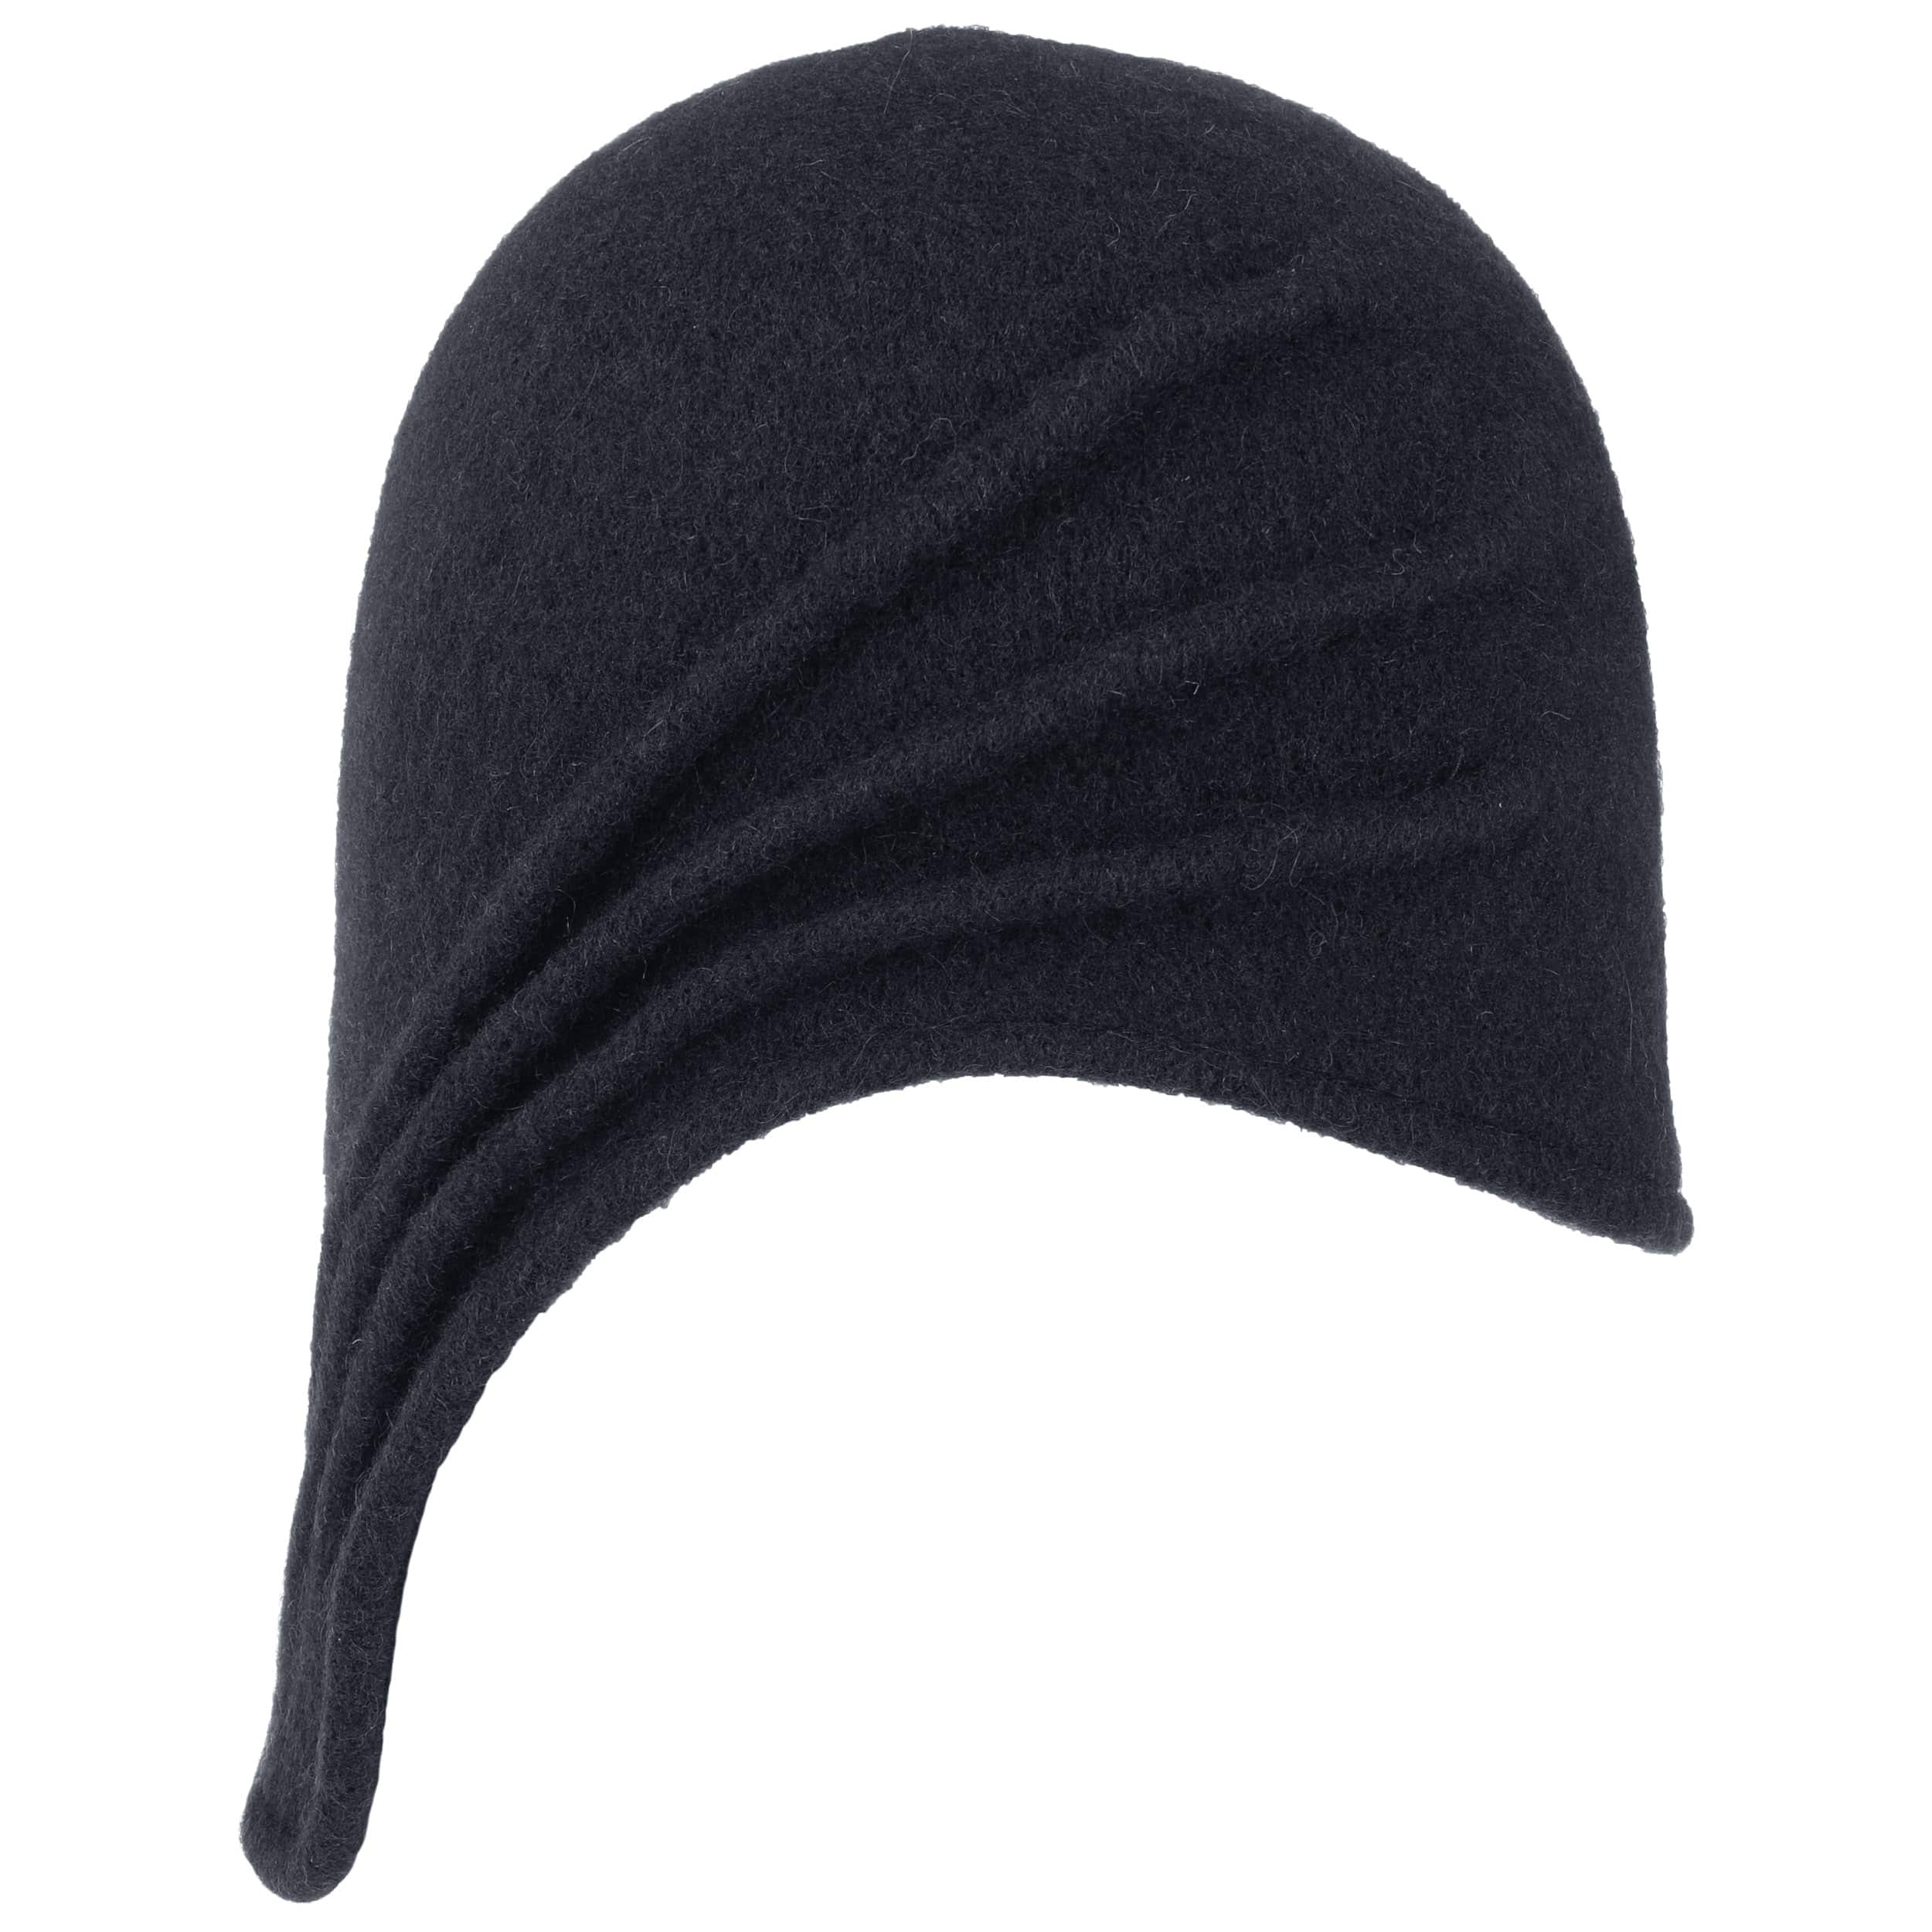 Gorro Asimétrico de Lana Nobila by Lipodo - Gorros - sombreroshop.es 85da45f36fa